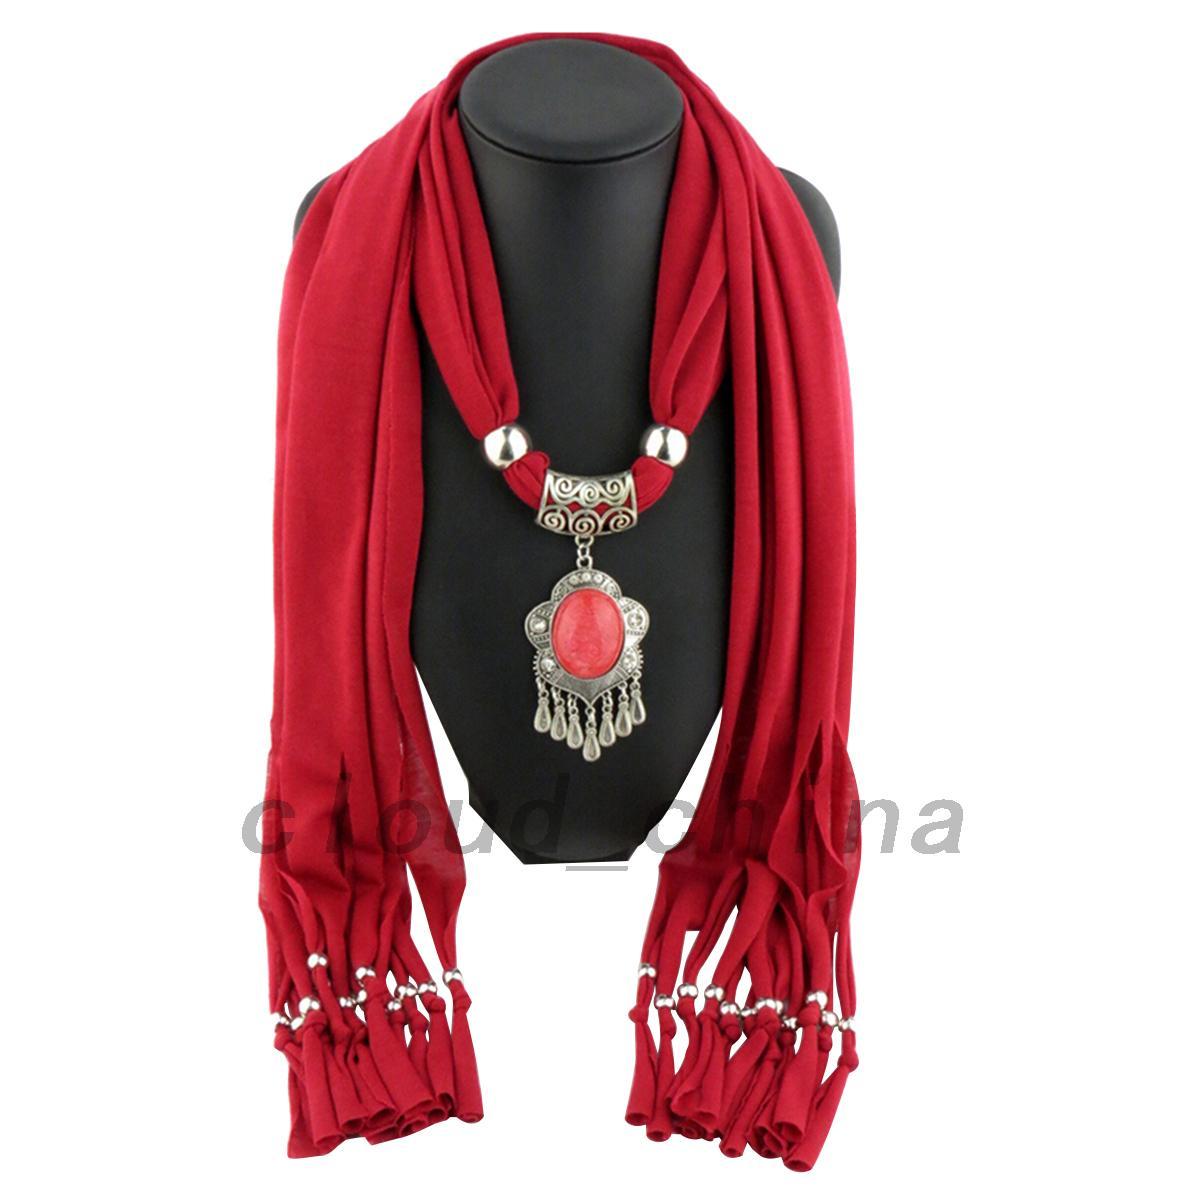 fantastic winter jeweled pendant scarf scarves neck